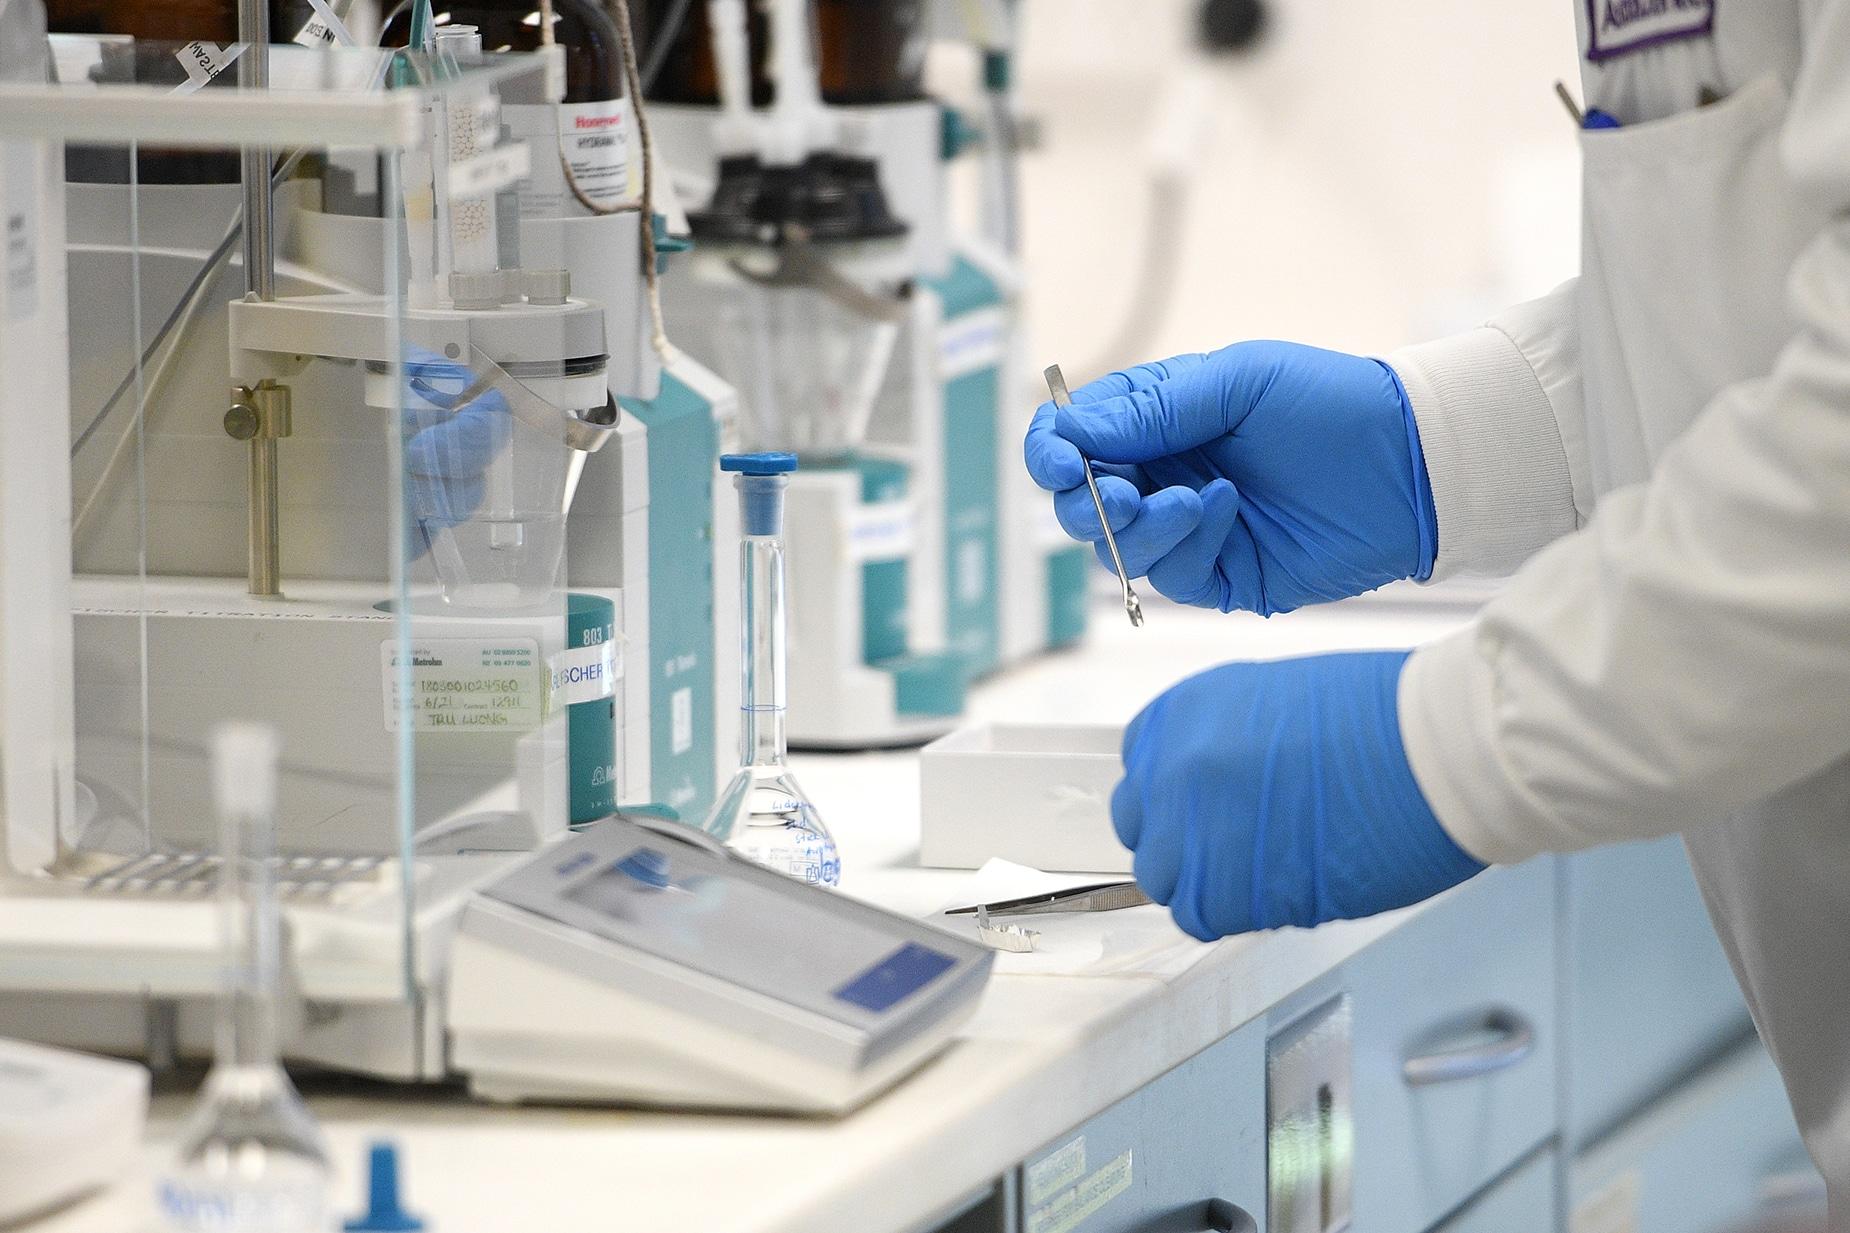 AstraZeneca εμβόλιο: Κατέθεσε αίτηση για έγκριση κυκλοφορίας στον ΕΜΑ